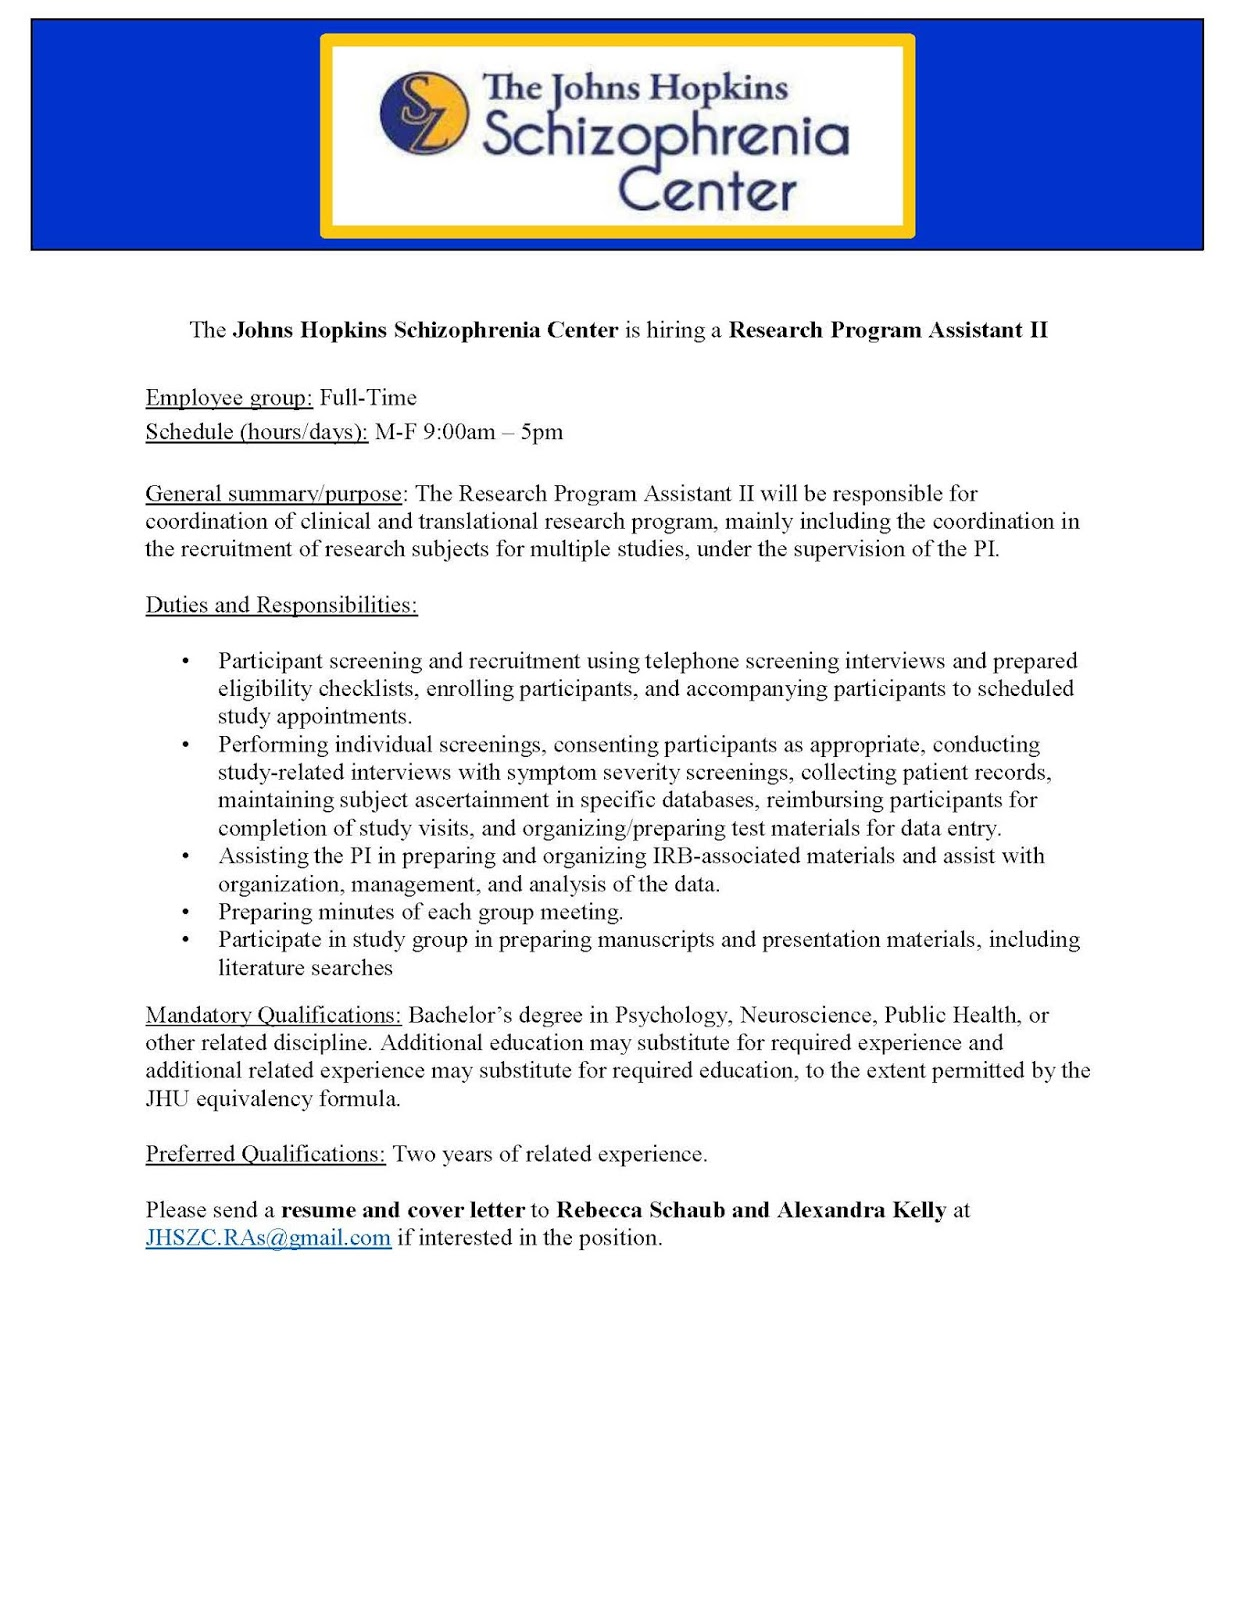 Indiana University Psychology & Neuroscience Blog: JHU